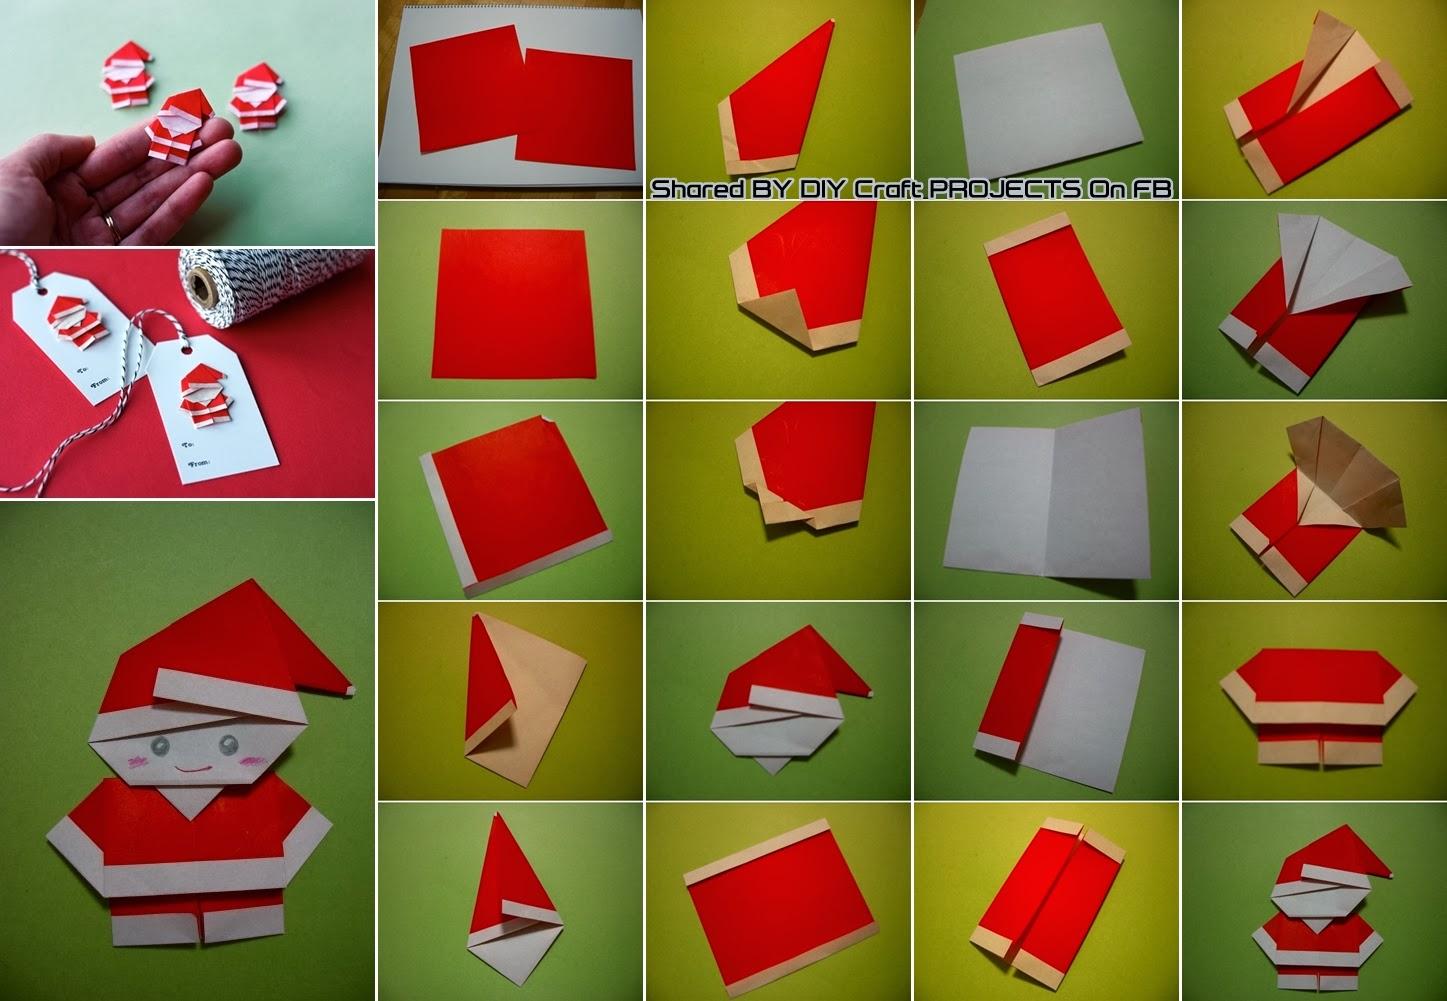 diy origami santa diy craft projects. Black Bedroom Furniture Sets. Home Design Ideas